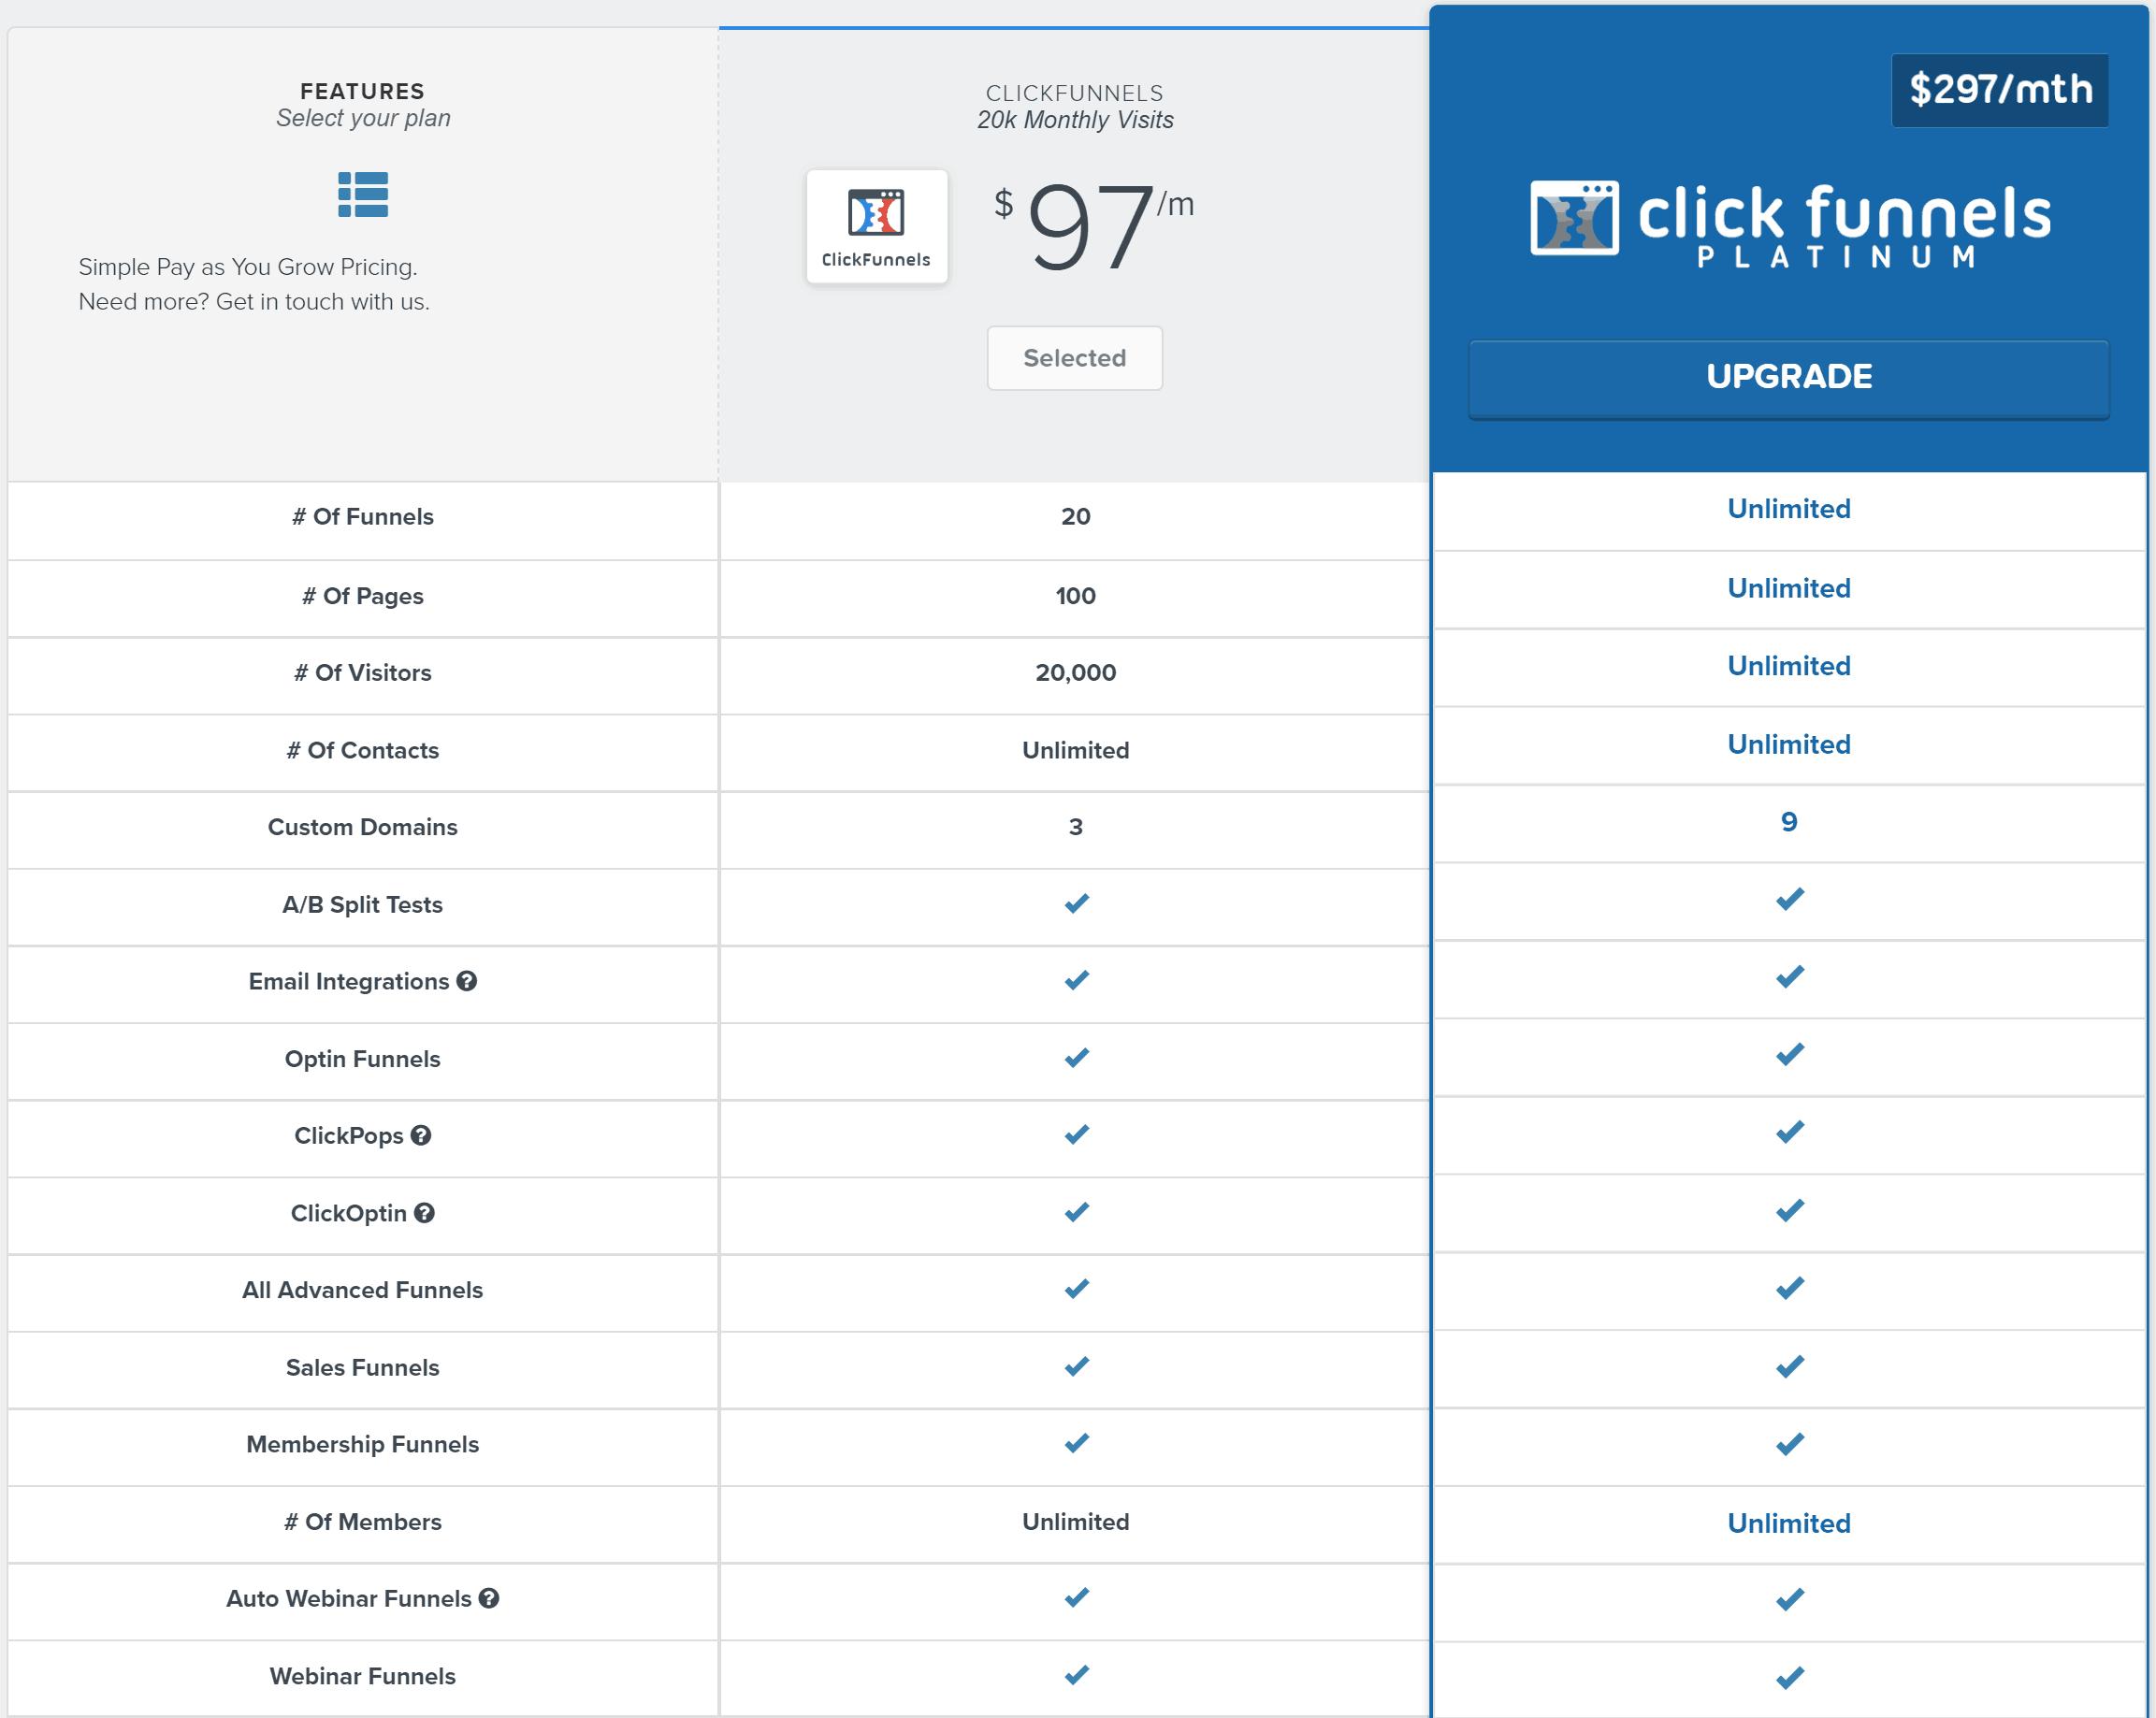 ClickFunnels Pricing: Startup and ClickFunnels Platinum